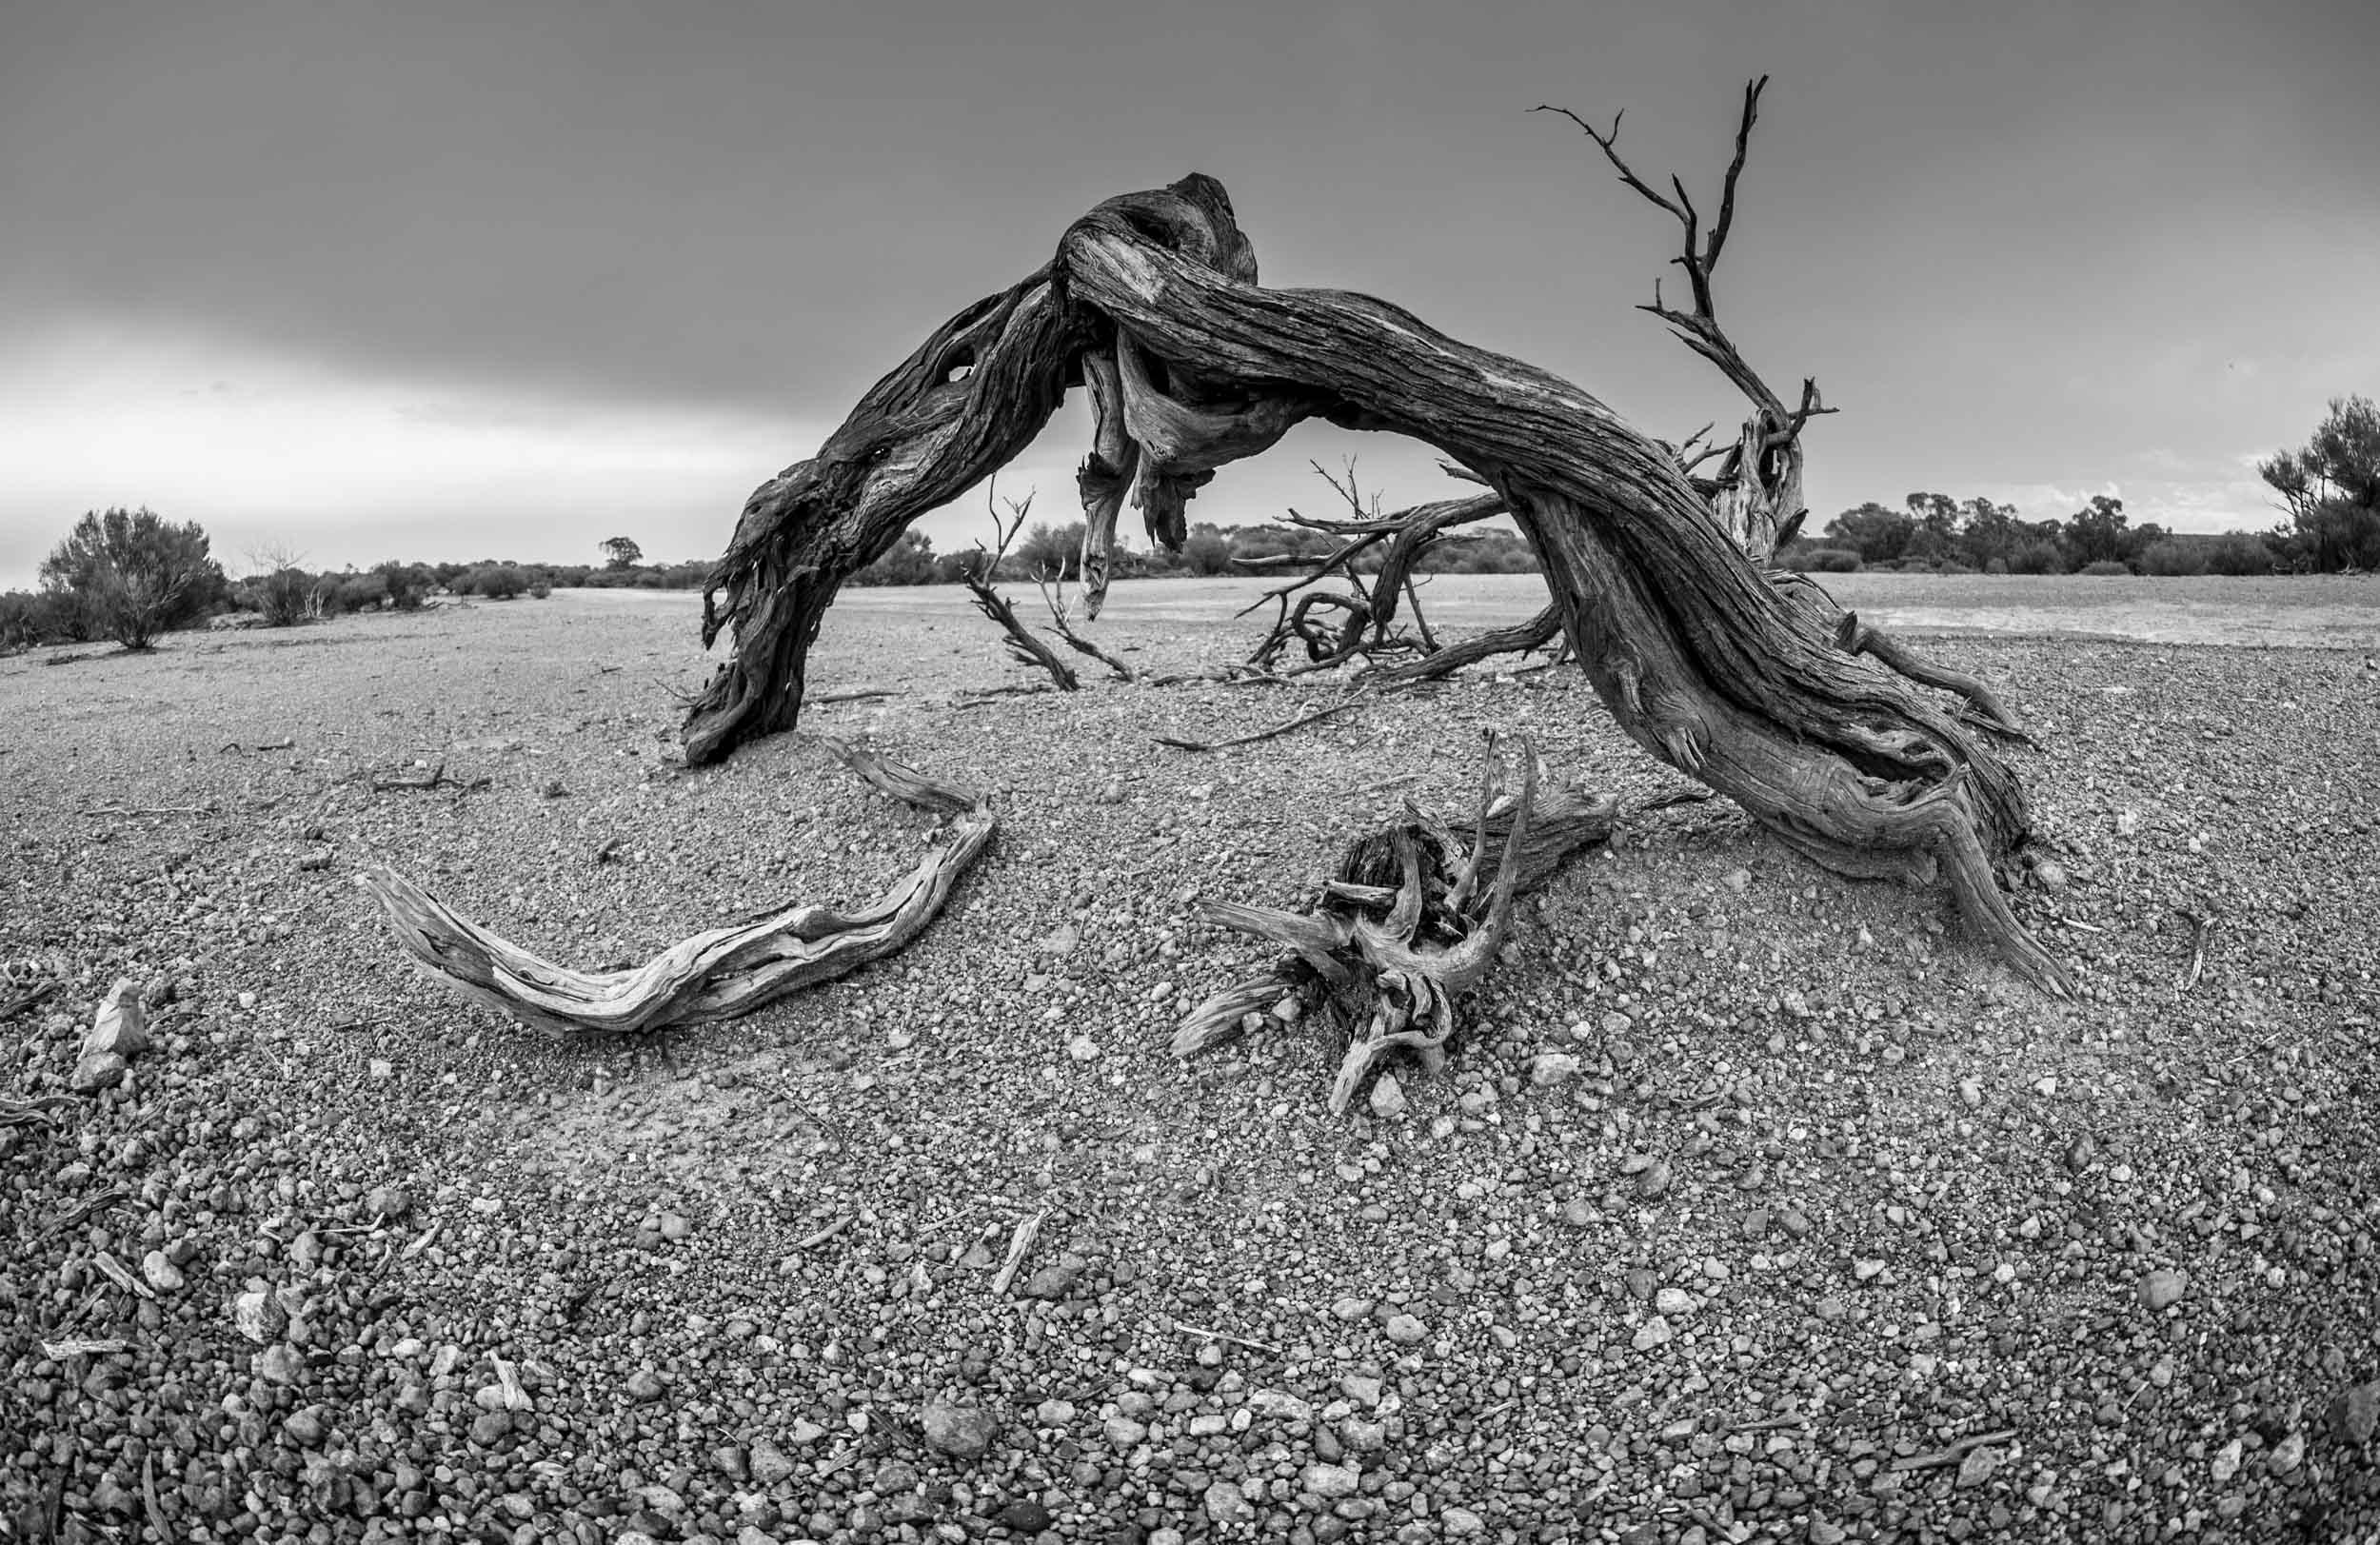 outback photography courses sydney-1.jpg